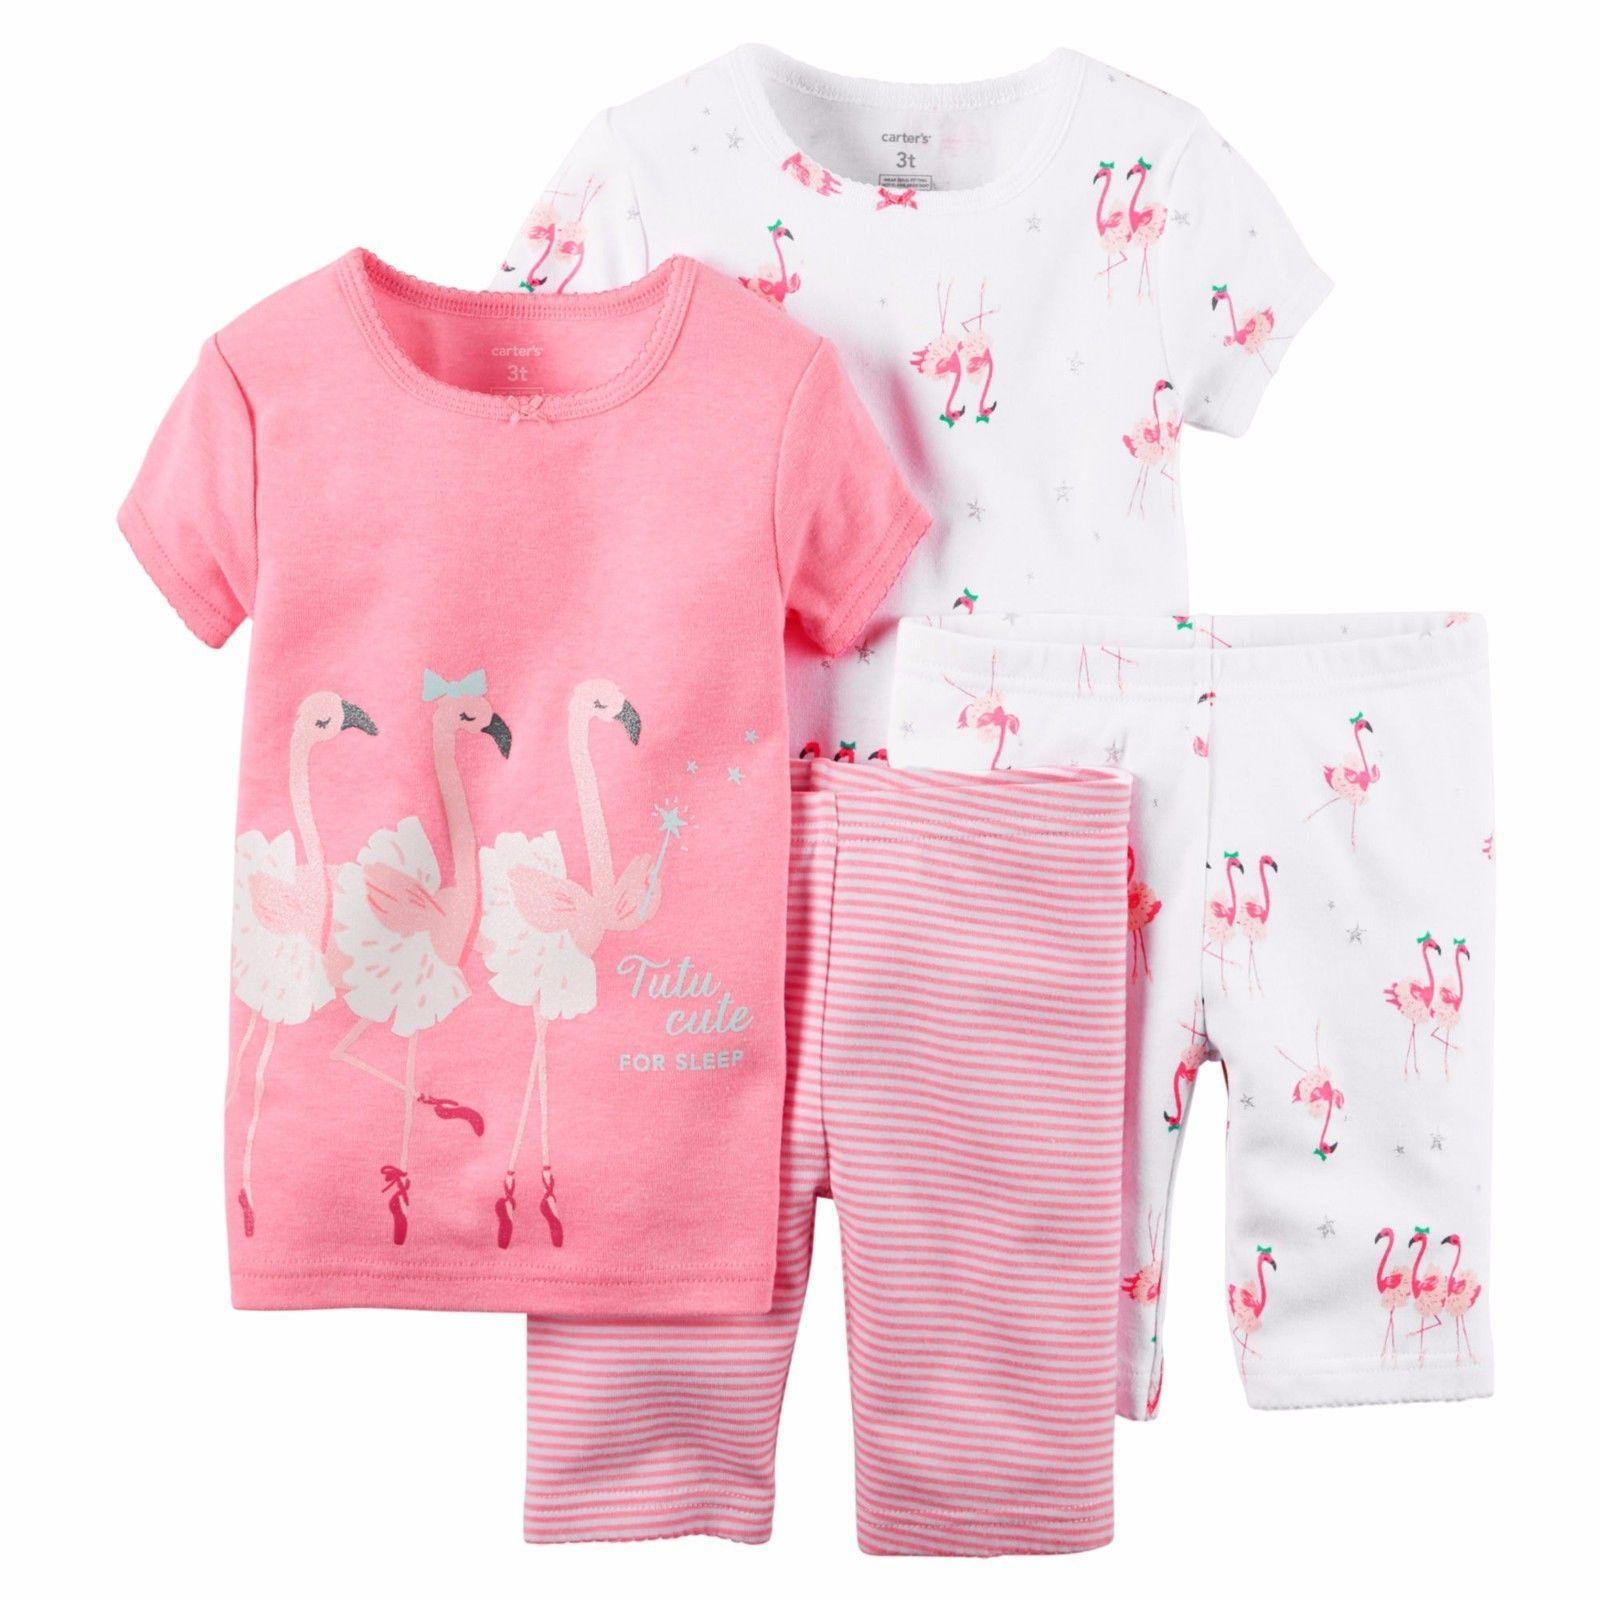 Sleepwear Carter S Girls 4 Piece Pajamas Set Msrp$44 00 Size